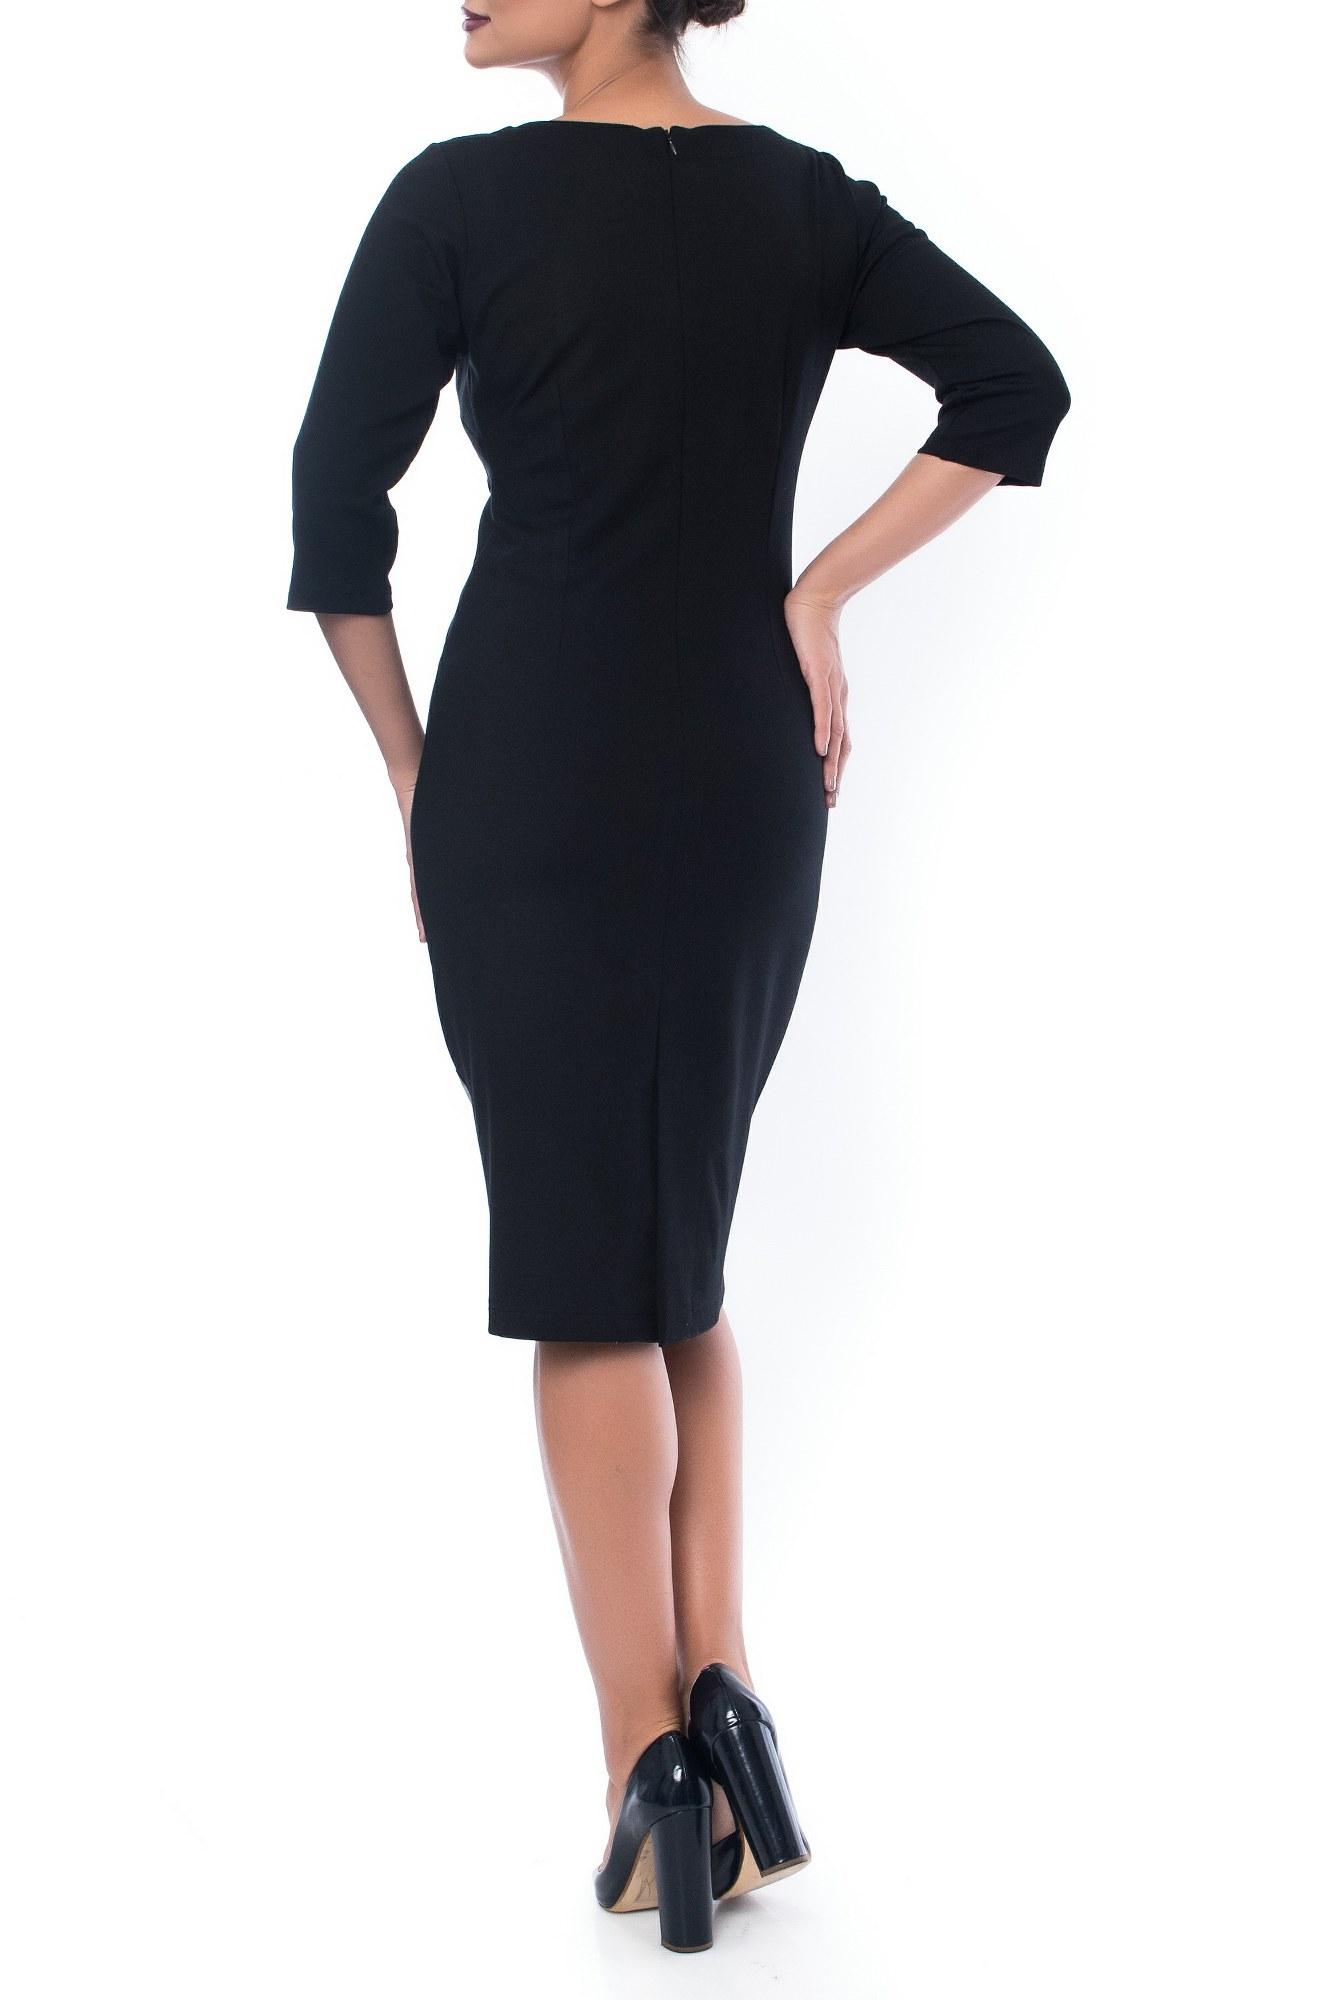 Rochie neagra cu buline din piele ecologica